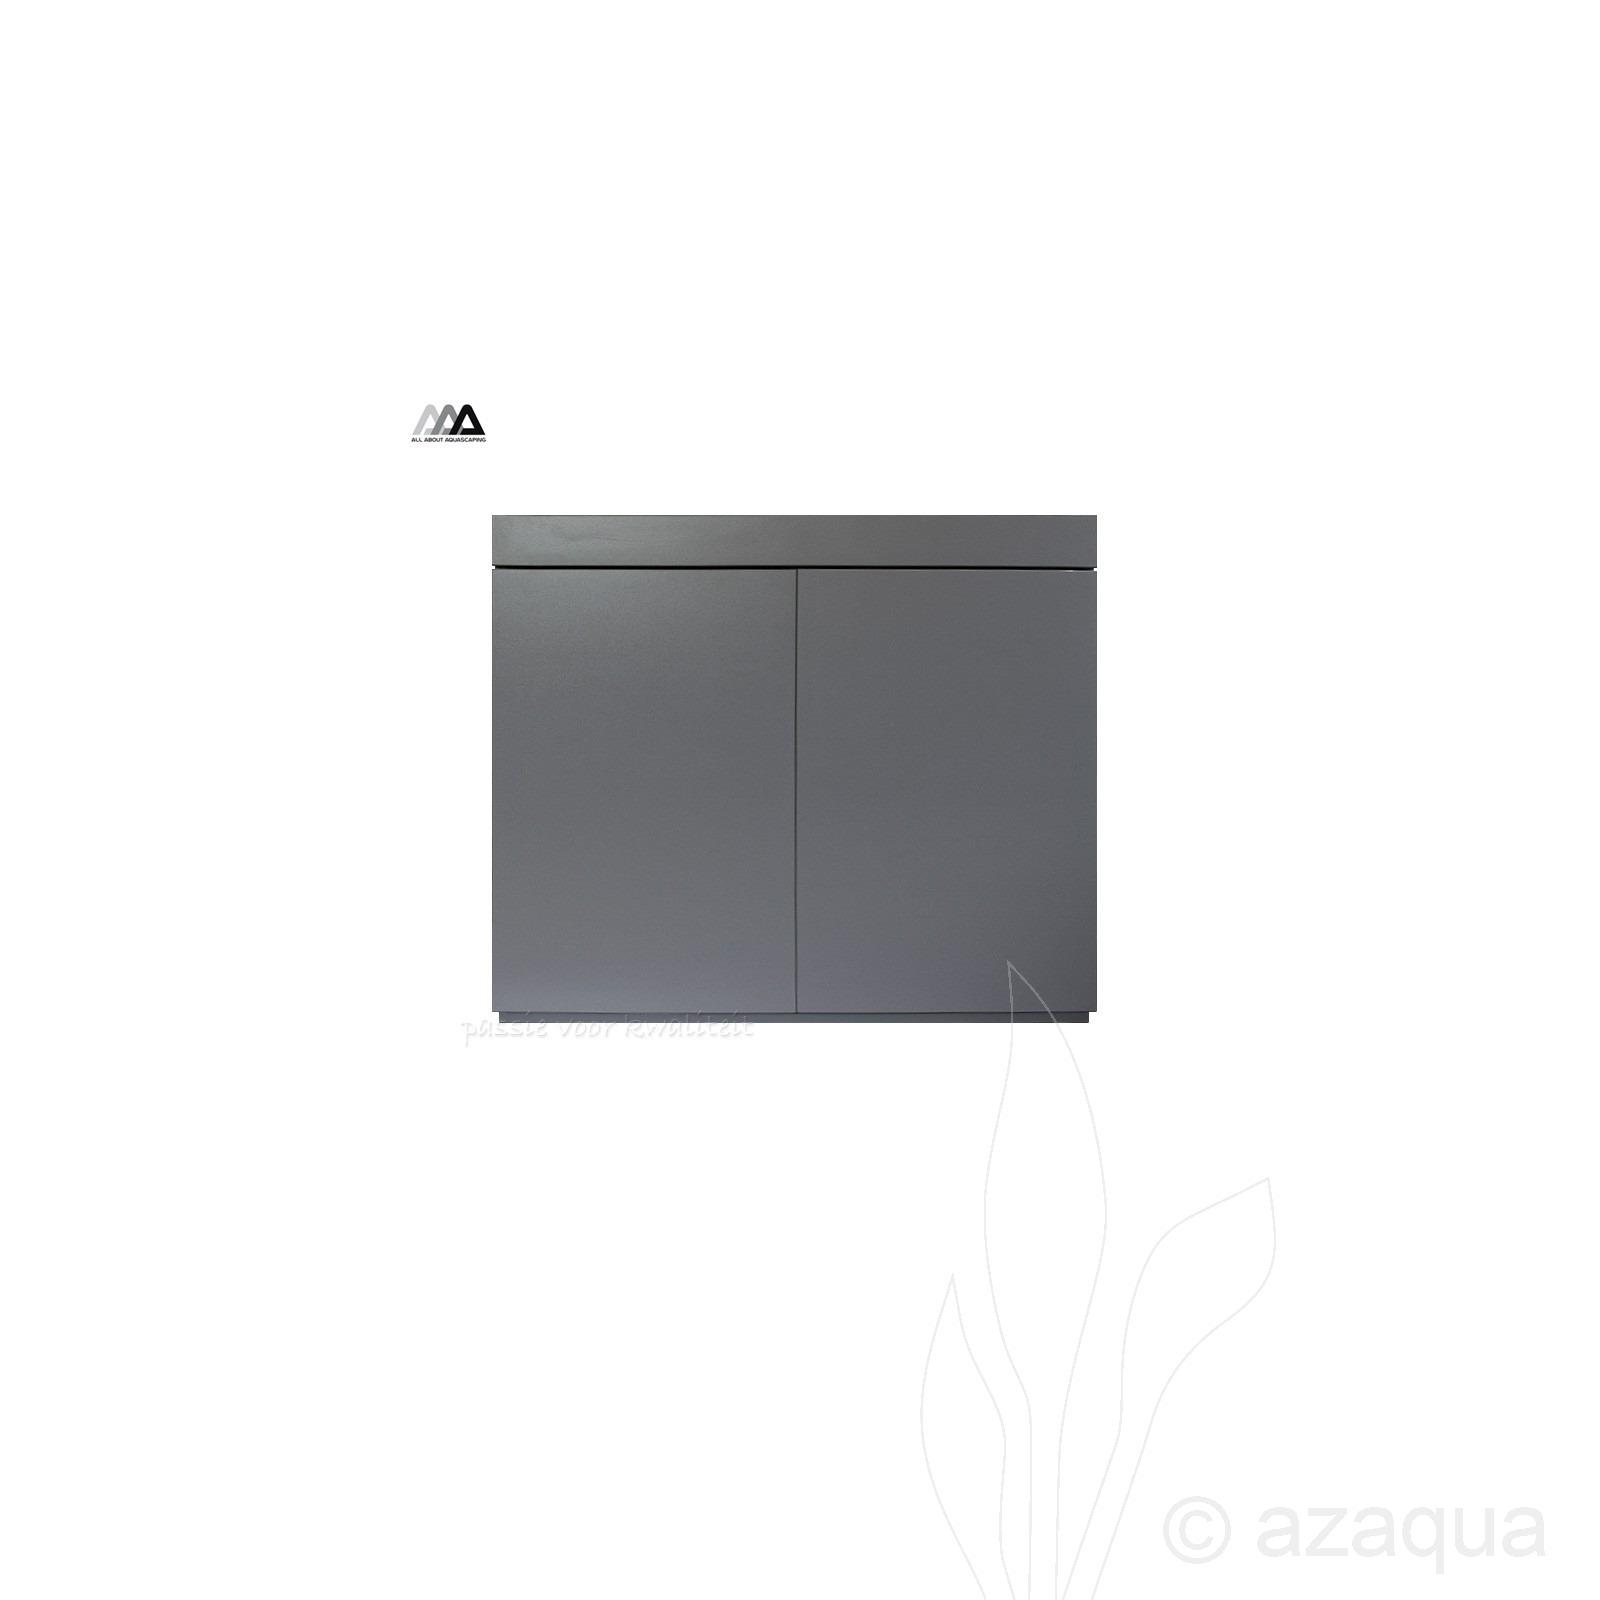 Aquarium meubel (90x45x80cm)   ADA stijl aquarium meubel